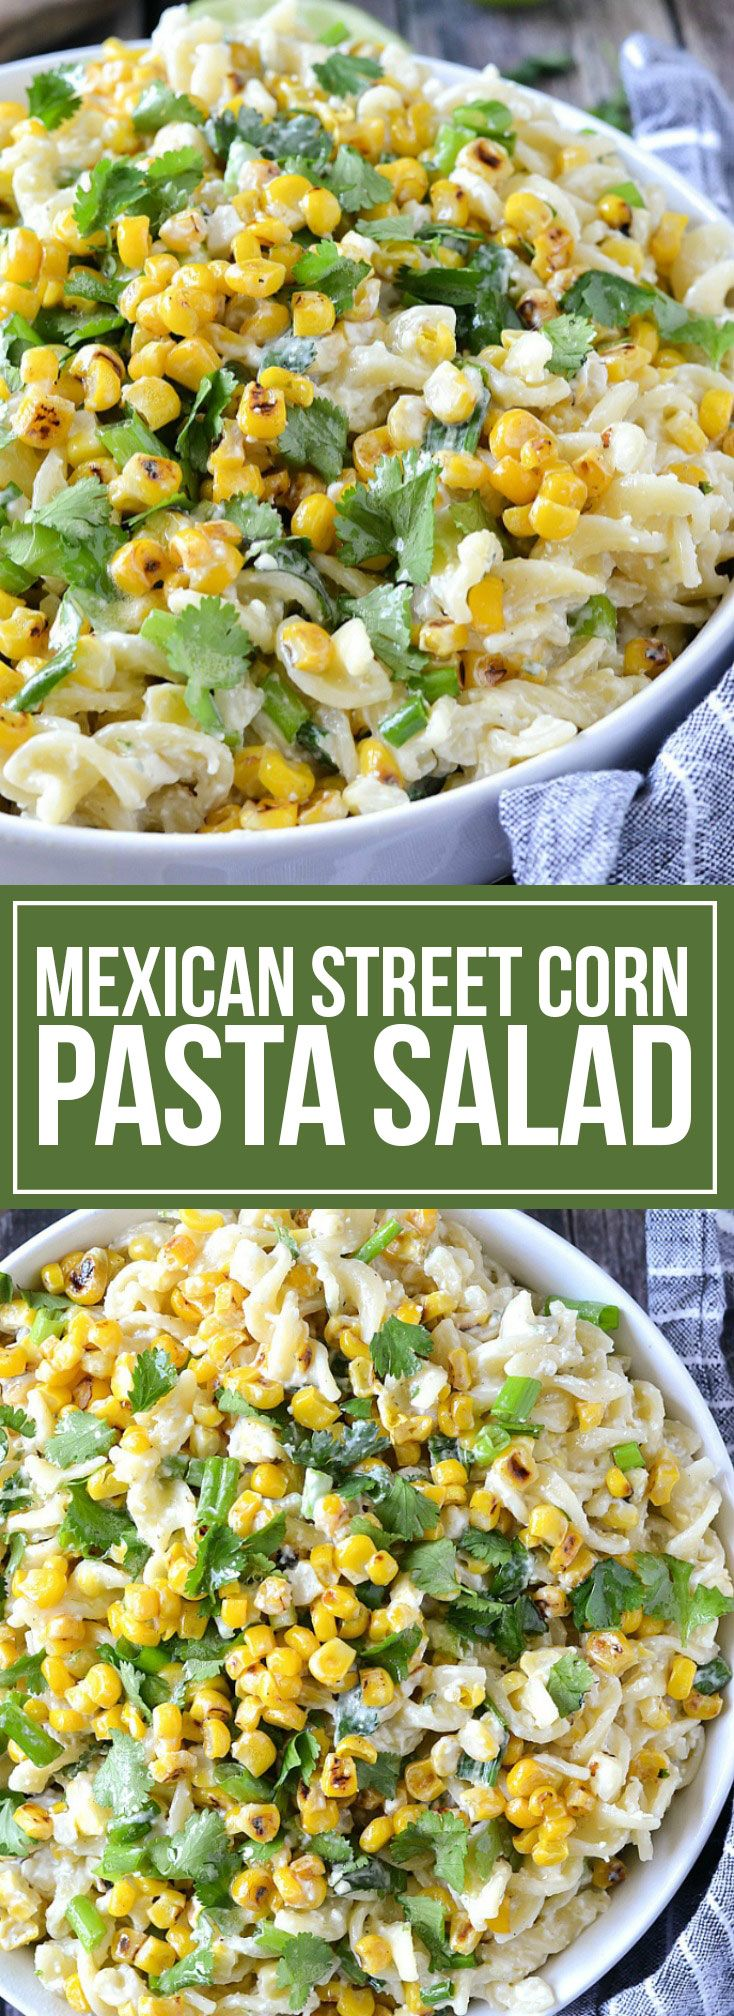 Mexican Street Corn Pasta Salad   – Schmackofatz.